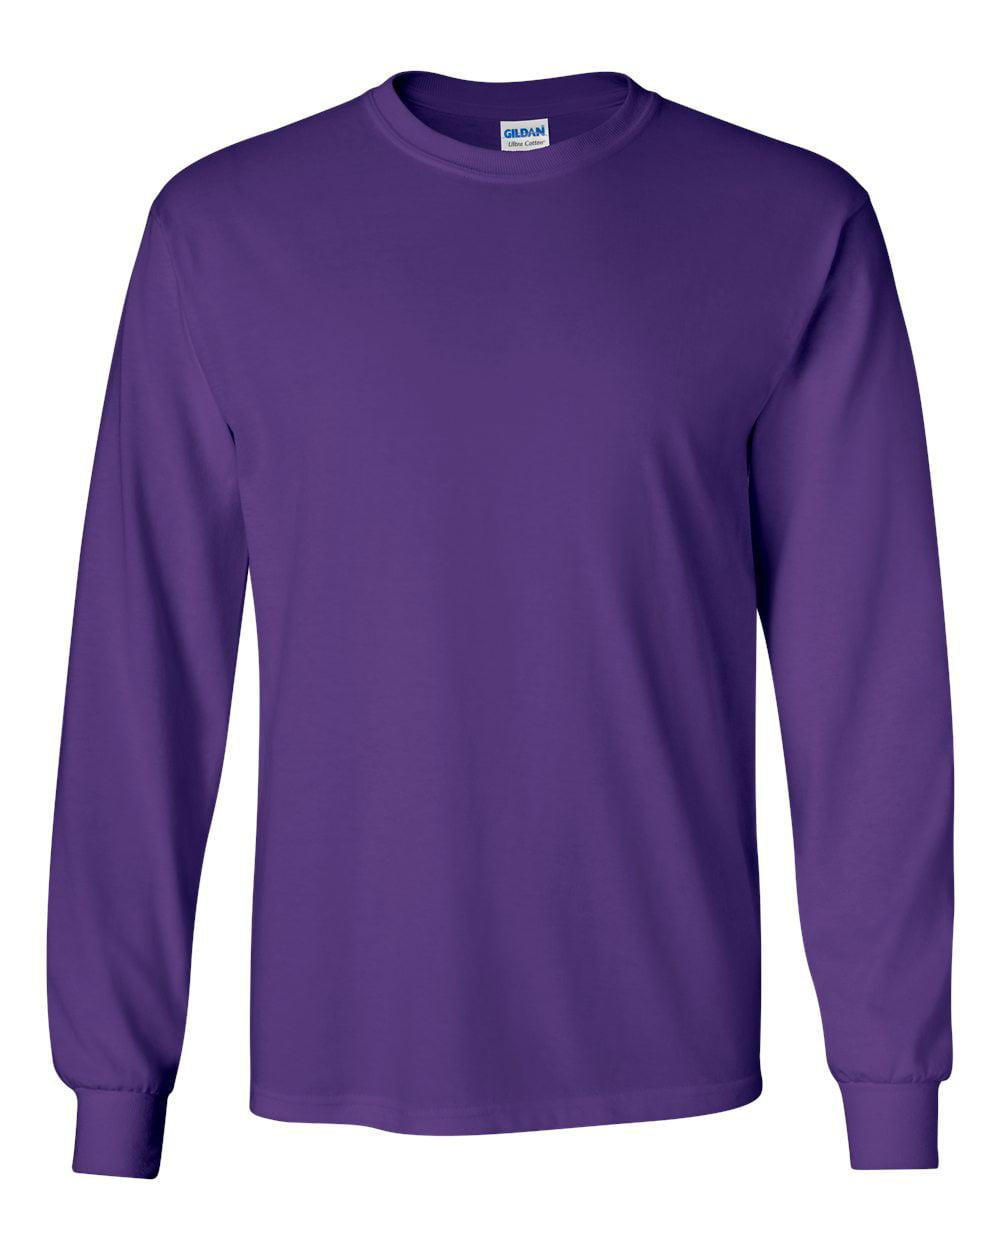 Gildan T-Shirts - Long Sleeve Ultra Cotton Long Sleeve T-Shirt ...